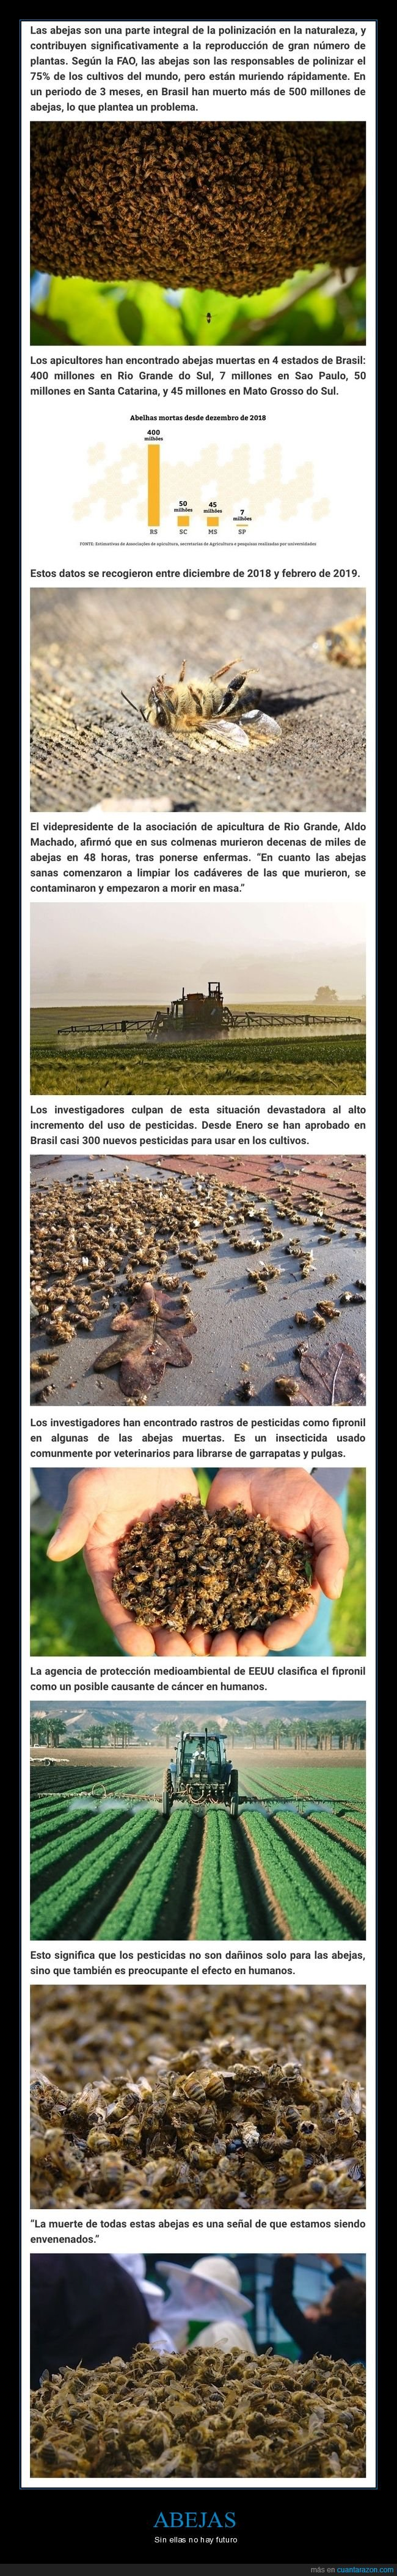 abejas,brasil,muriendo